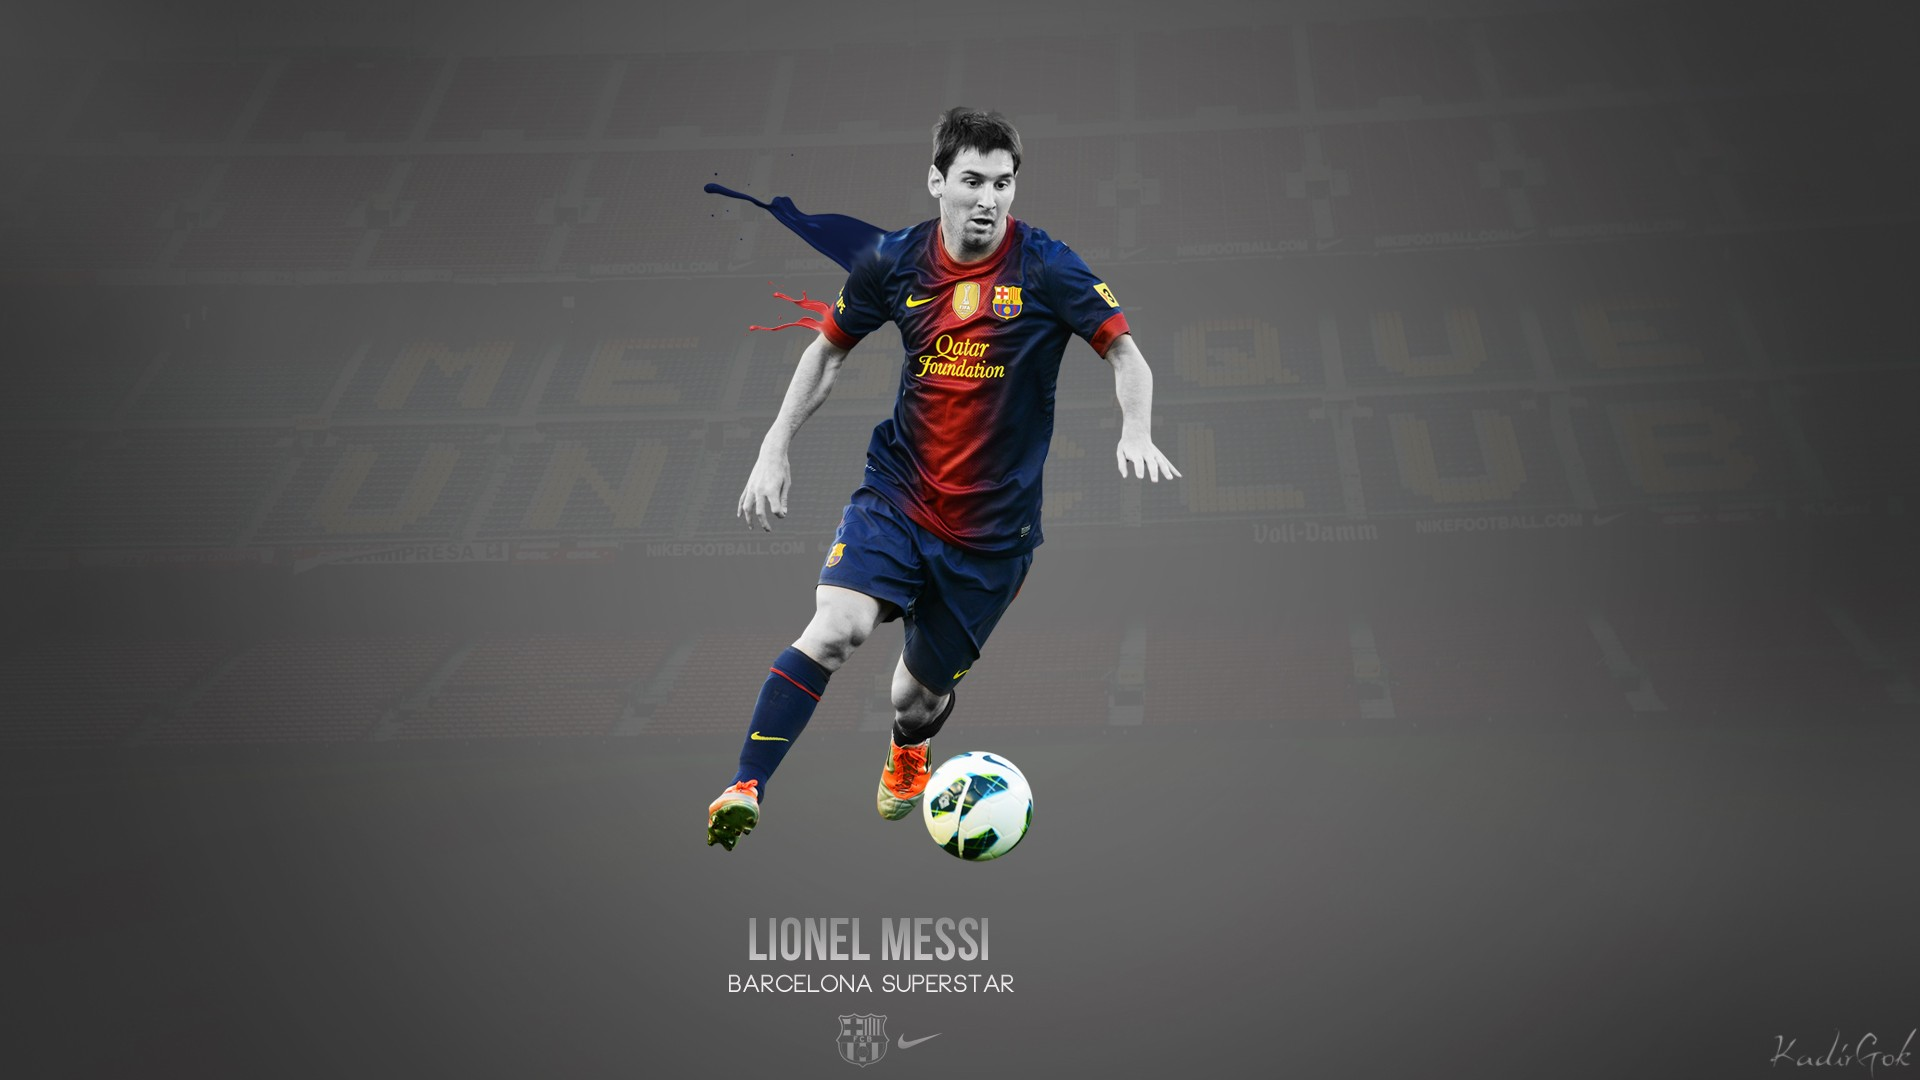 Lionel Messi Wallpaper Background Download HD 1920x1080